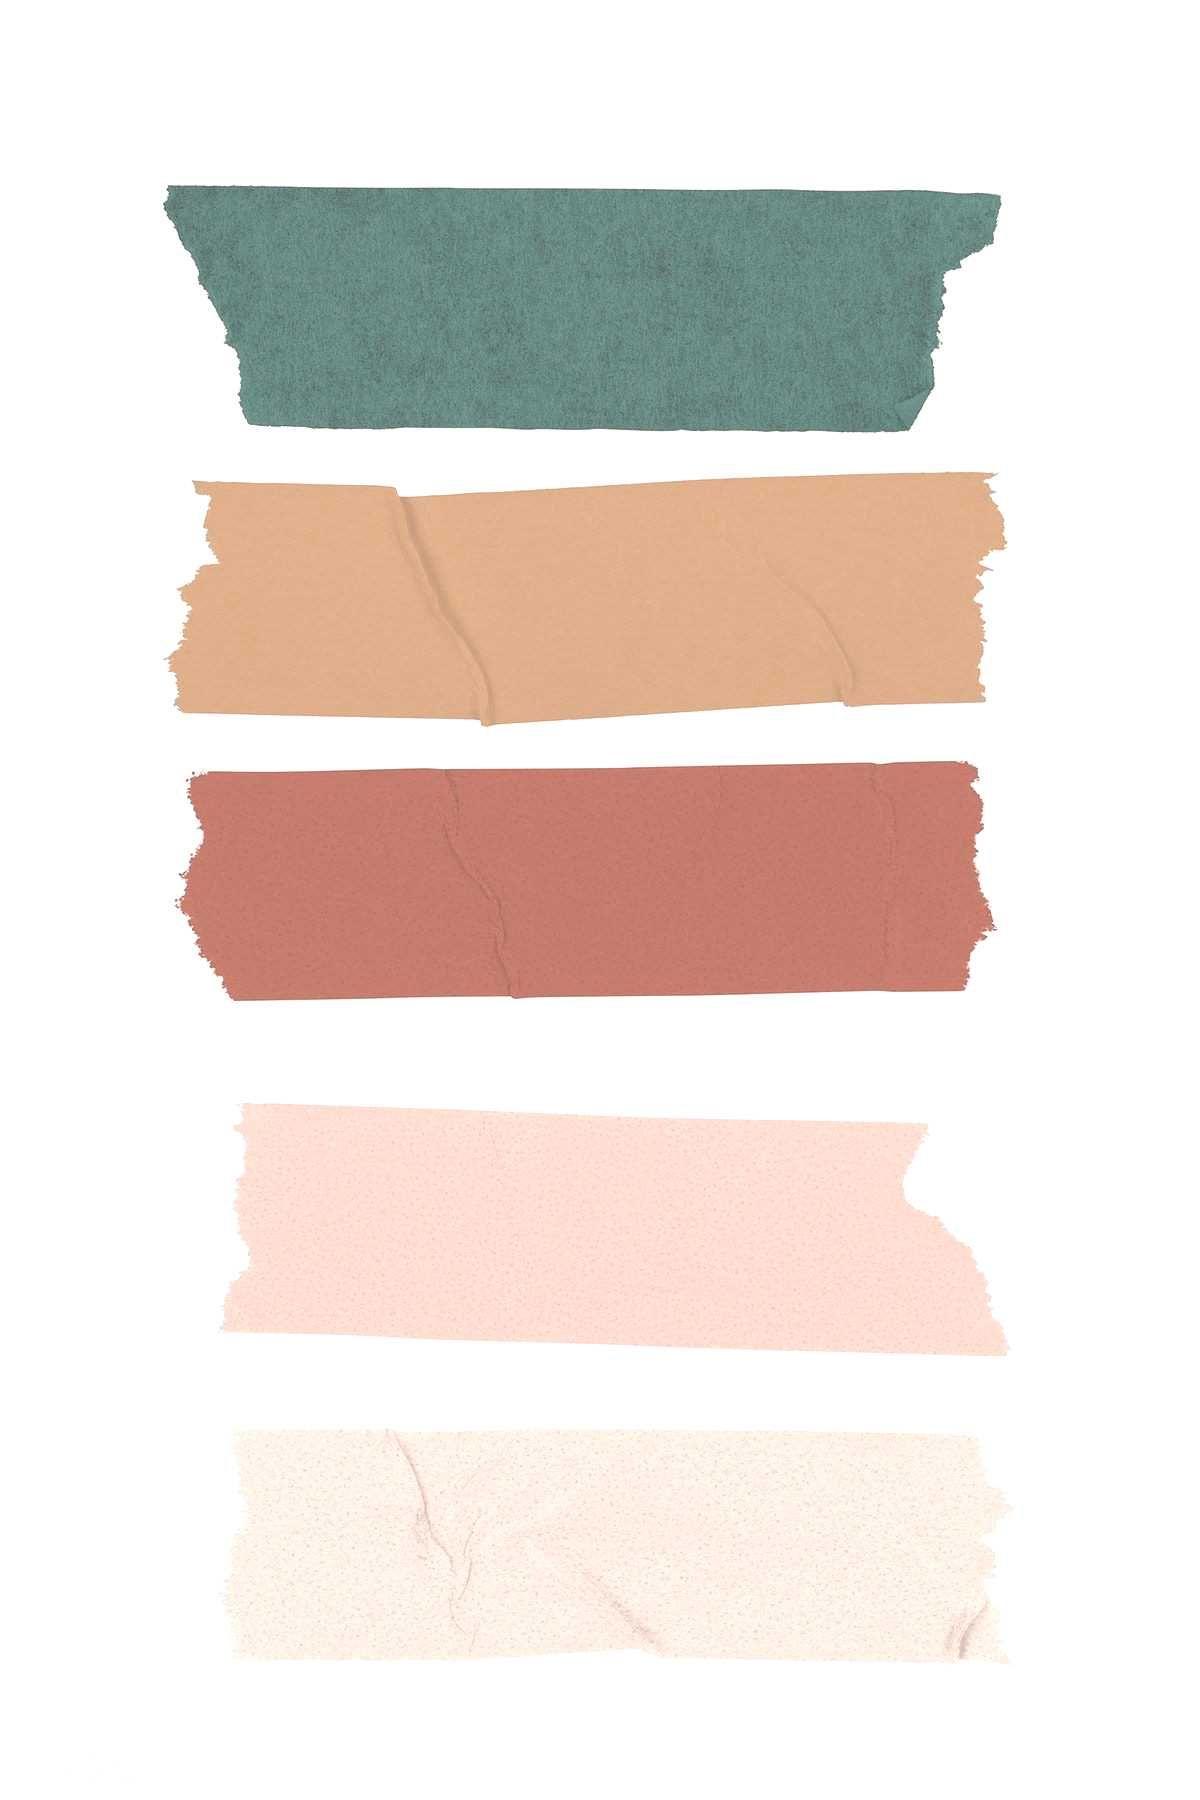 Hwangmangjoo Rawpixelcom Collection Colorful Premium Design Washi Image Tape By Colorful Washi Tape Design Colle Colorful Washi Tape Washi Tape Washi